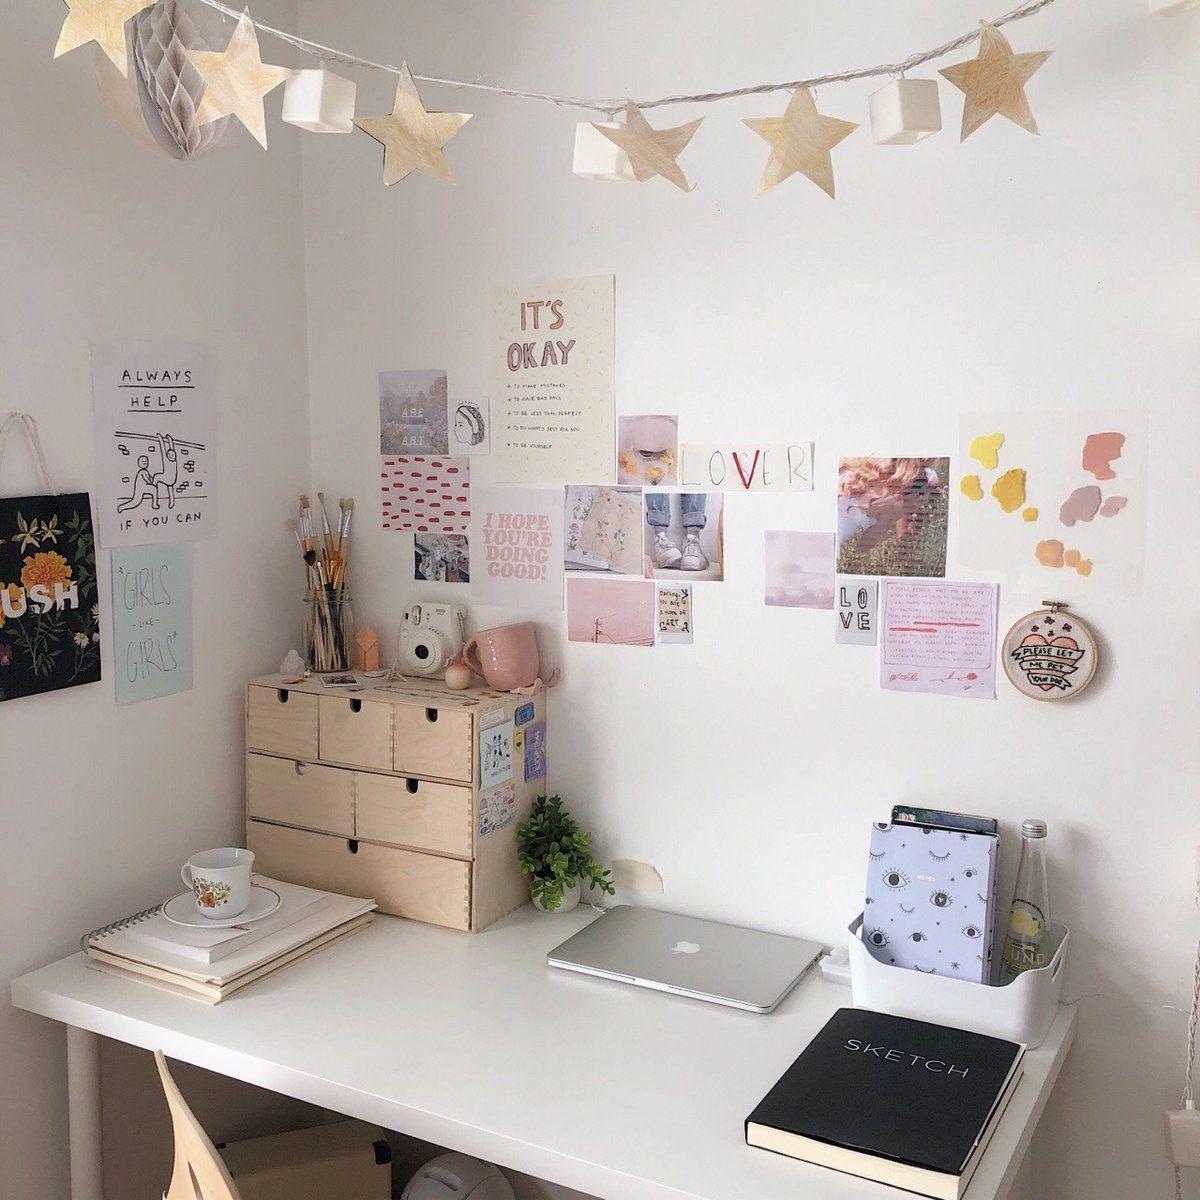 (4) Twitter | Study room decor, Aesthetic room decor, Room ...